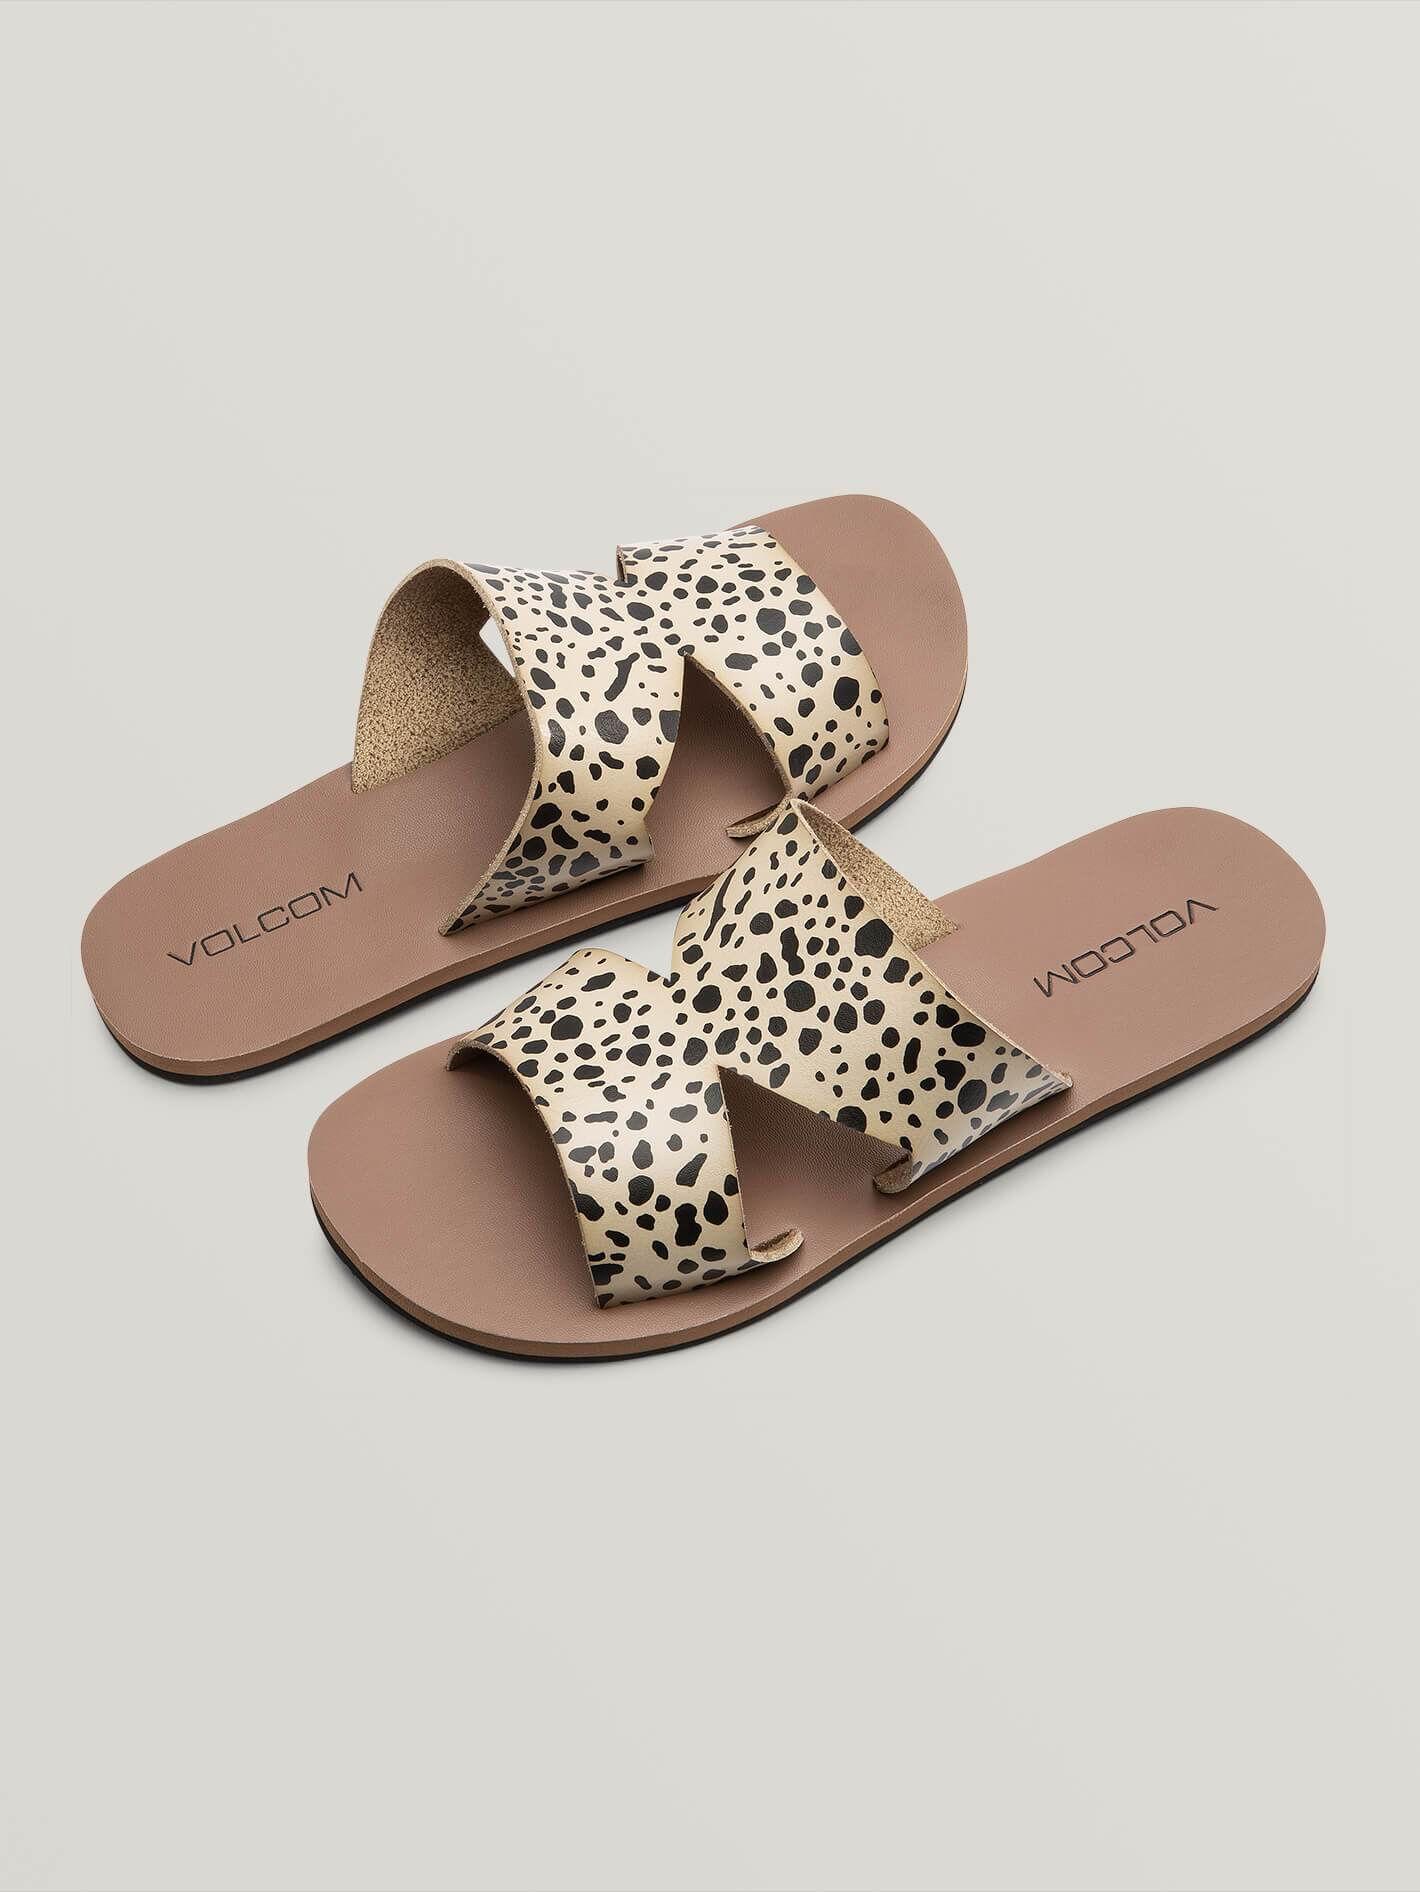 volcom Sandales Volcom Seeing Stones Leopard Femme